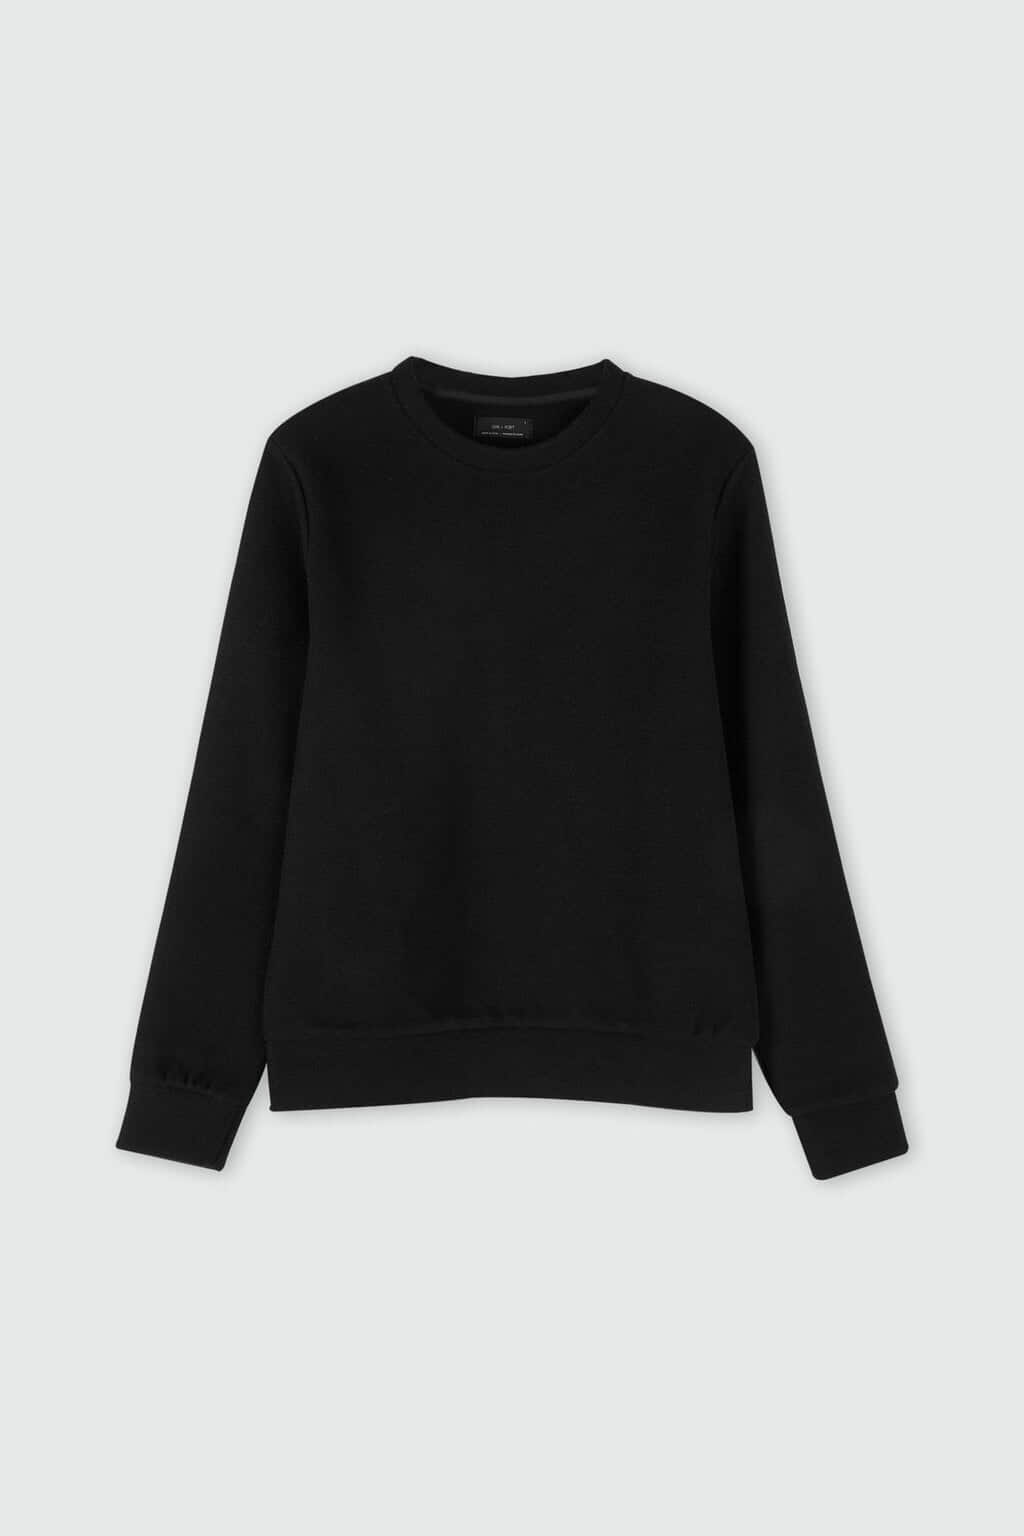 Sweatshirt 2668 Black 7